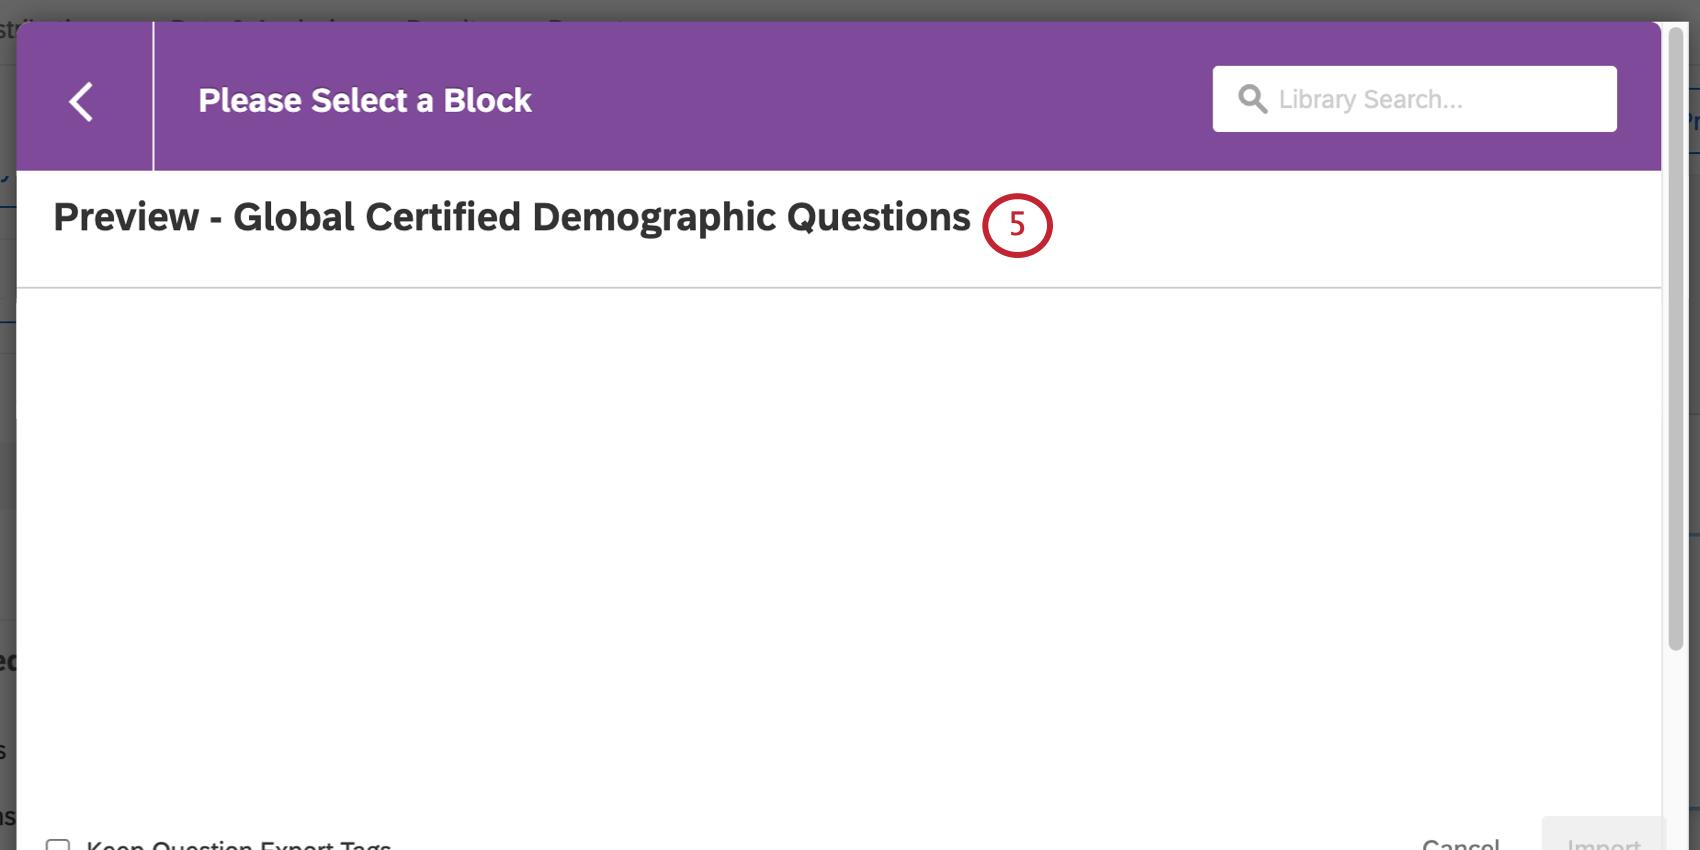 choosing the certified questions block